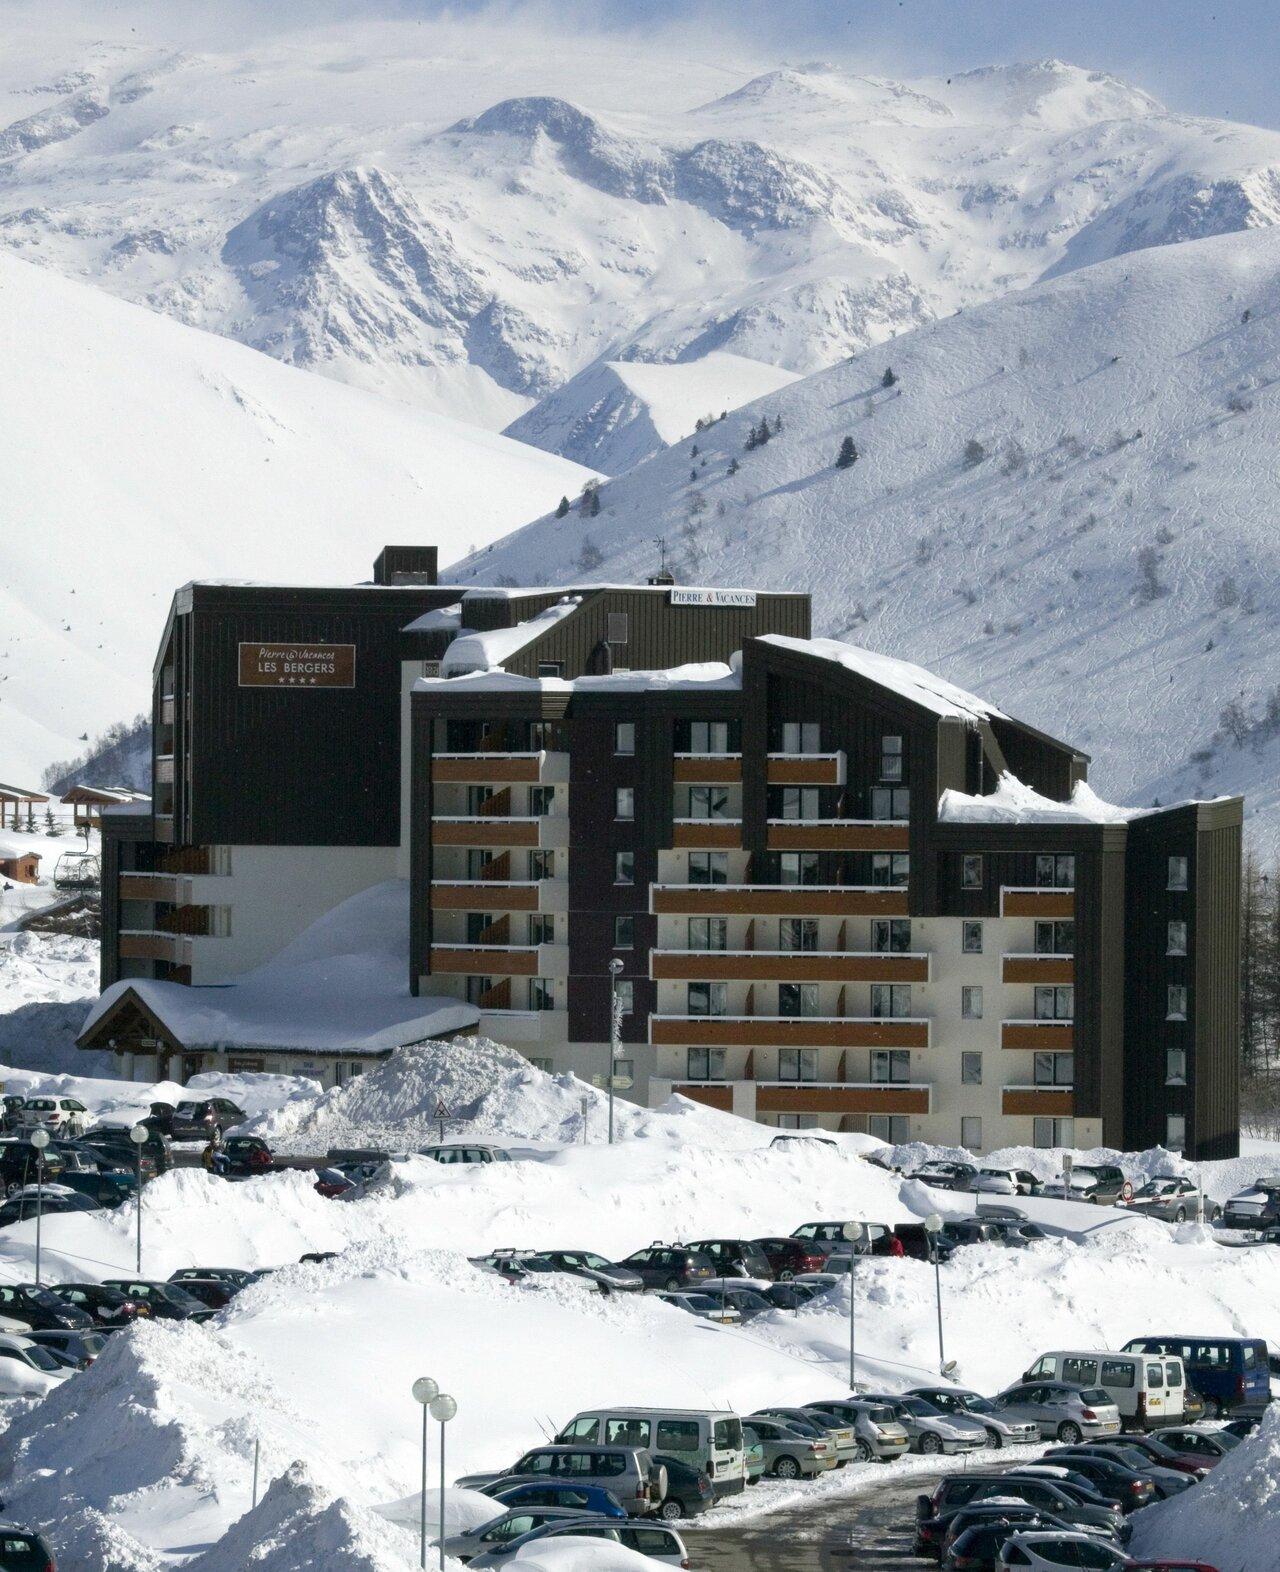 Pierre & Vacances Residence Les Bergers